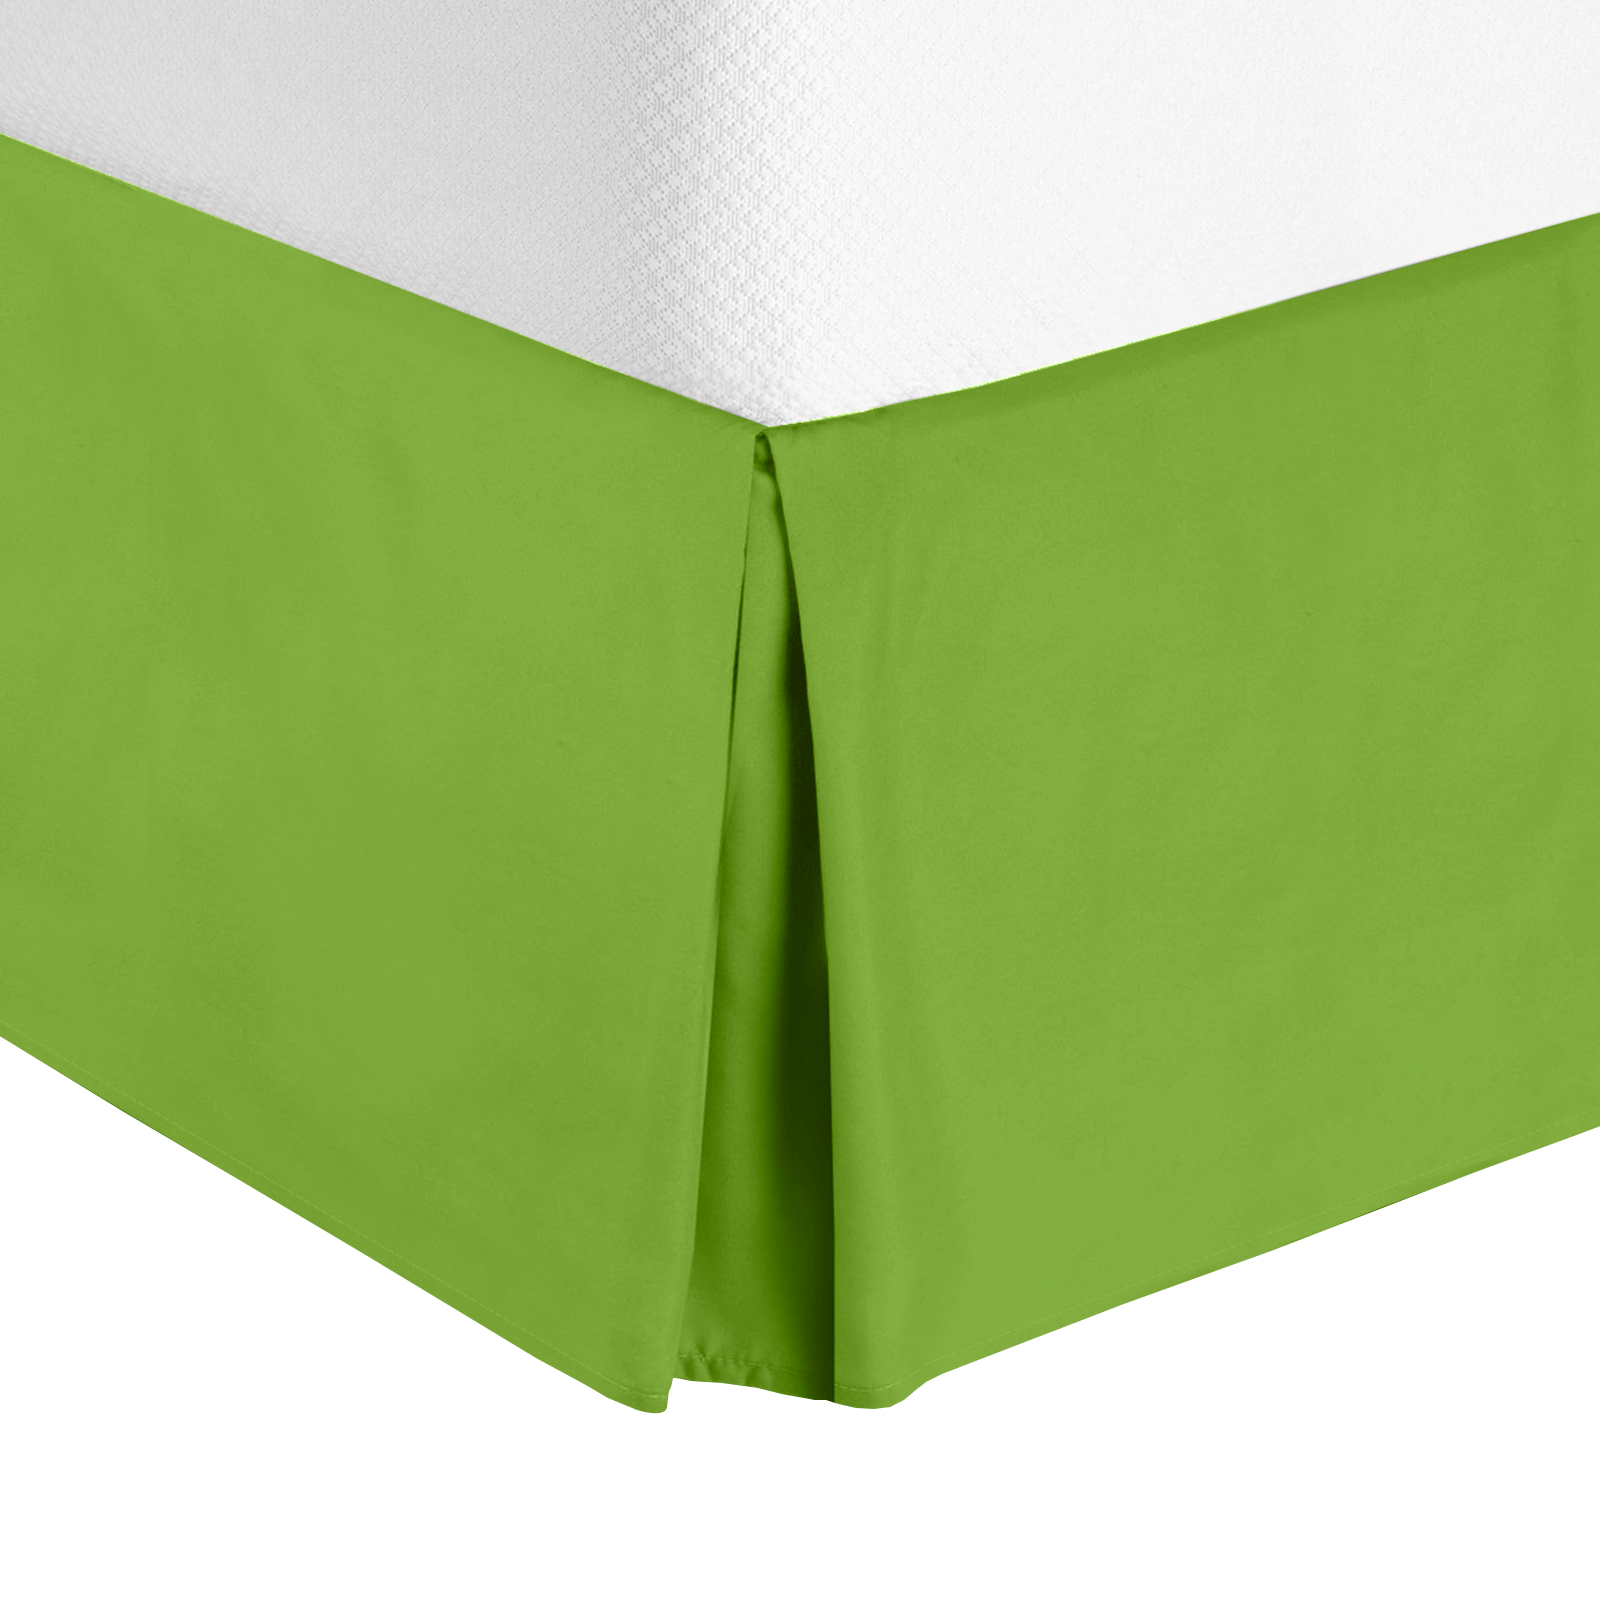 Green Bed Skirt Queen.Details About Luxury Pleated Tailored Bed Skirt 14 Drop Dust Ruffle Queen Garden Green